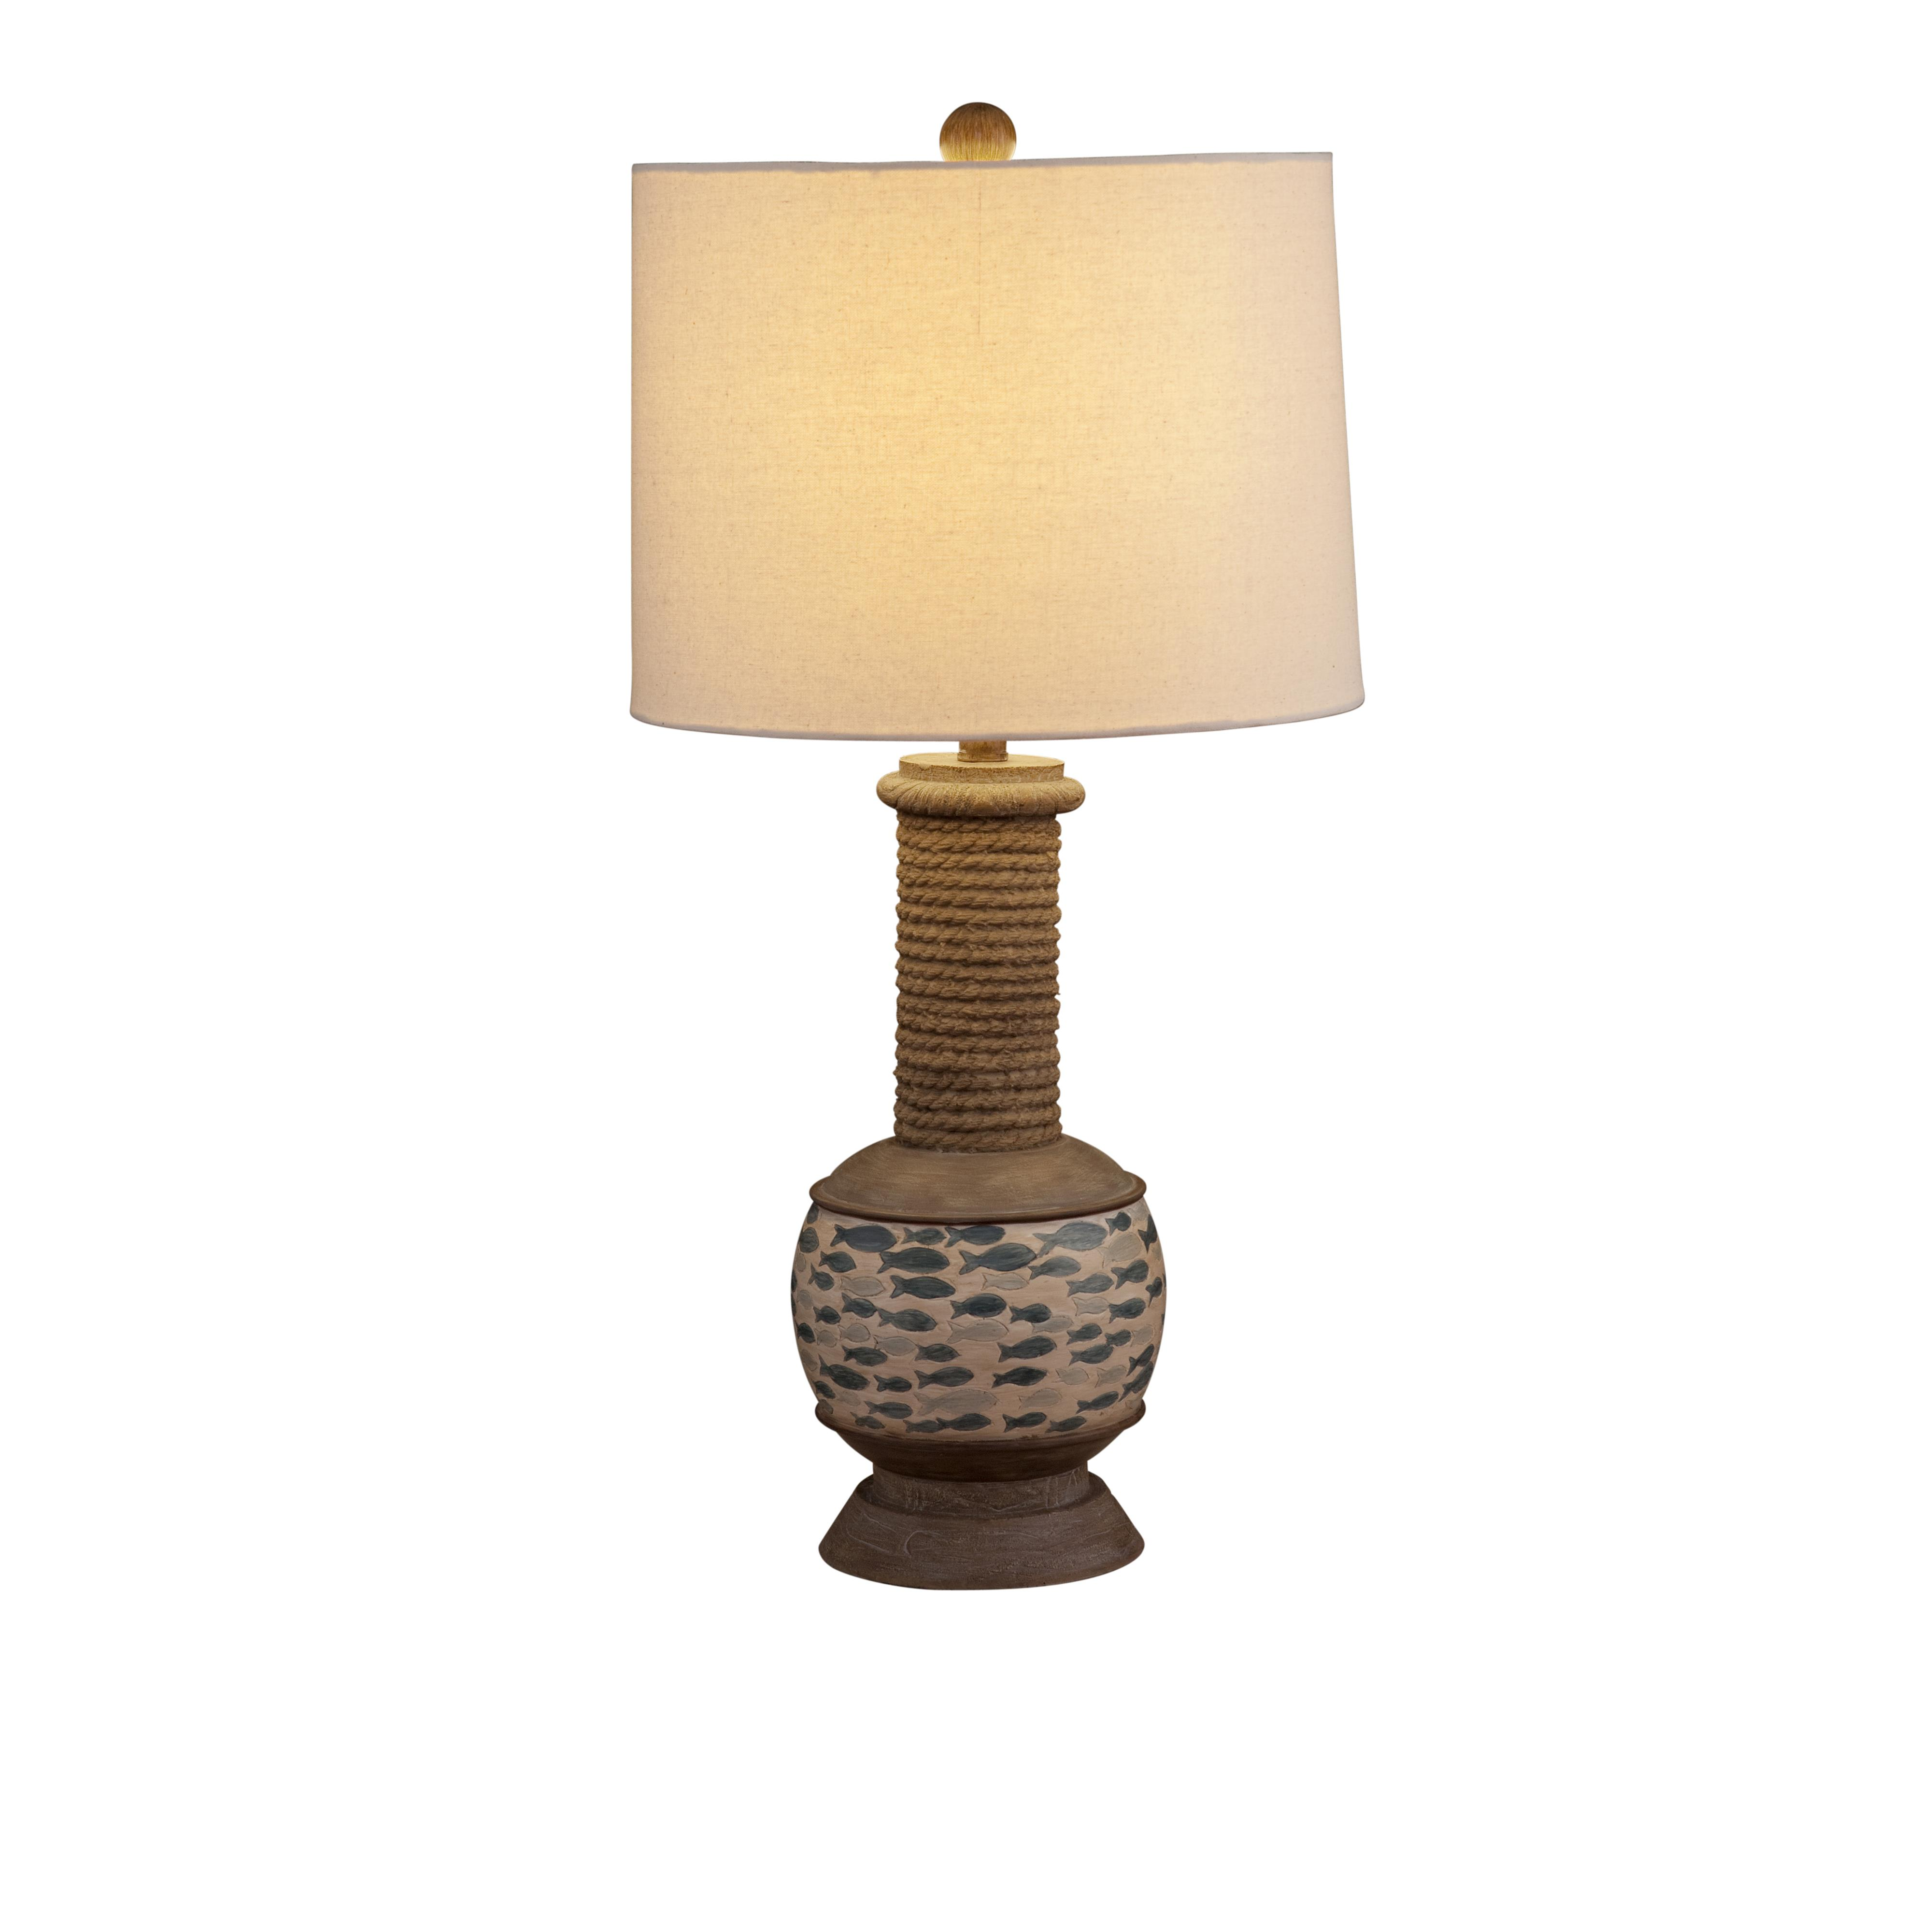 Pan Pacific Gulfstream Table Lamp by Bassett Mirror at Bullard Furniture